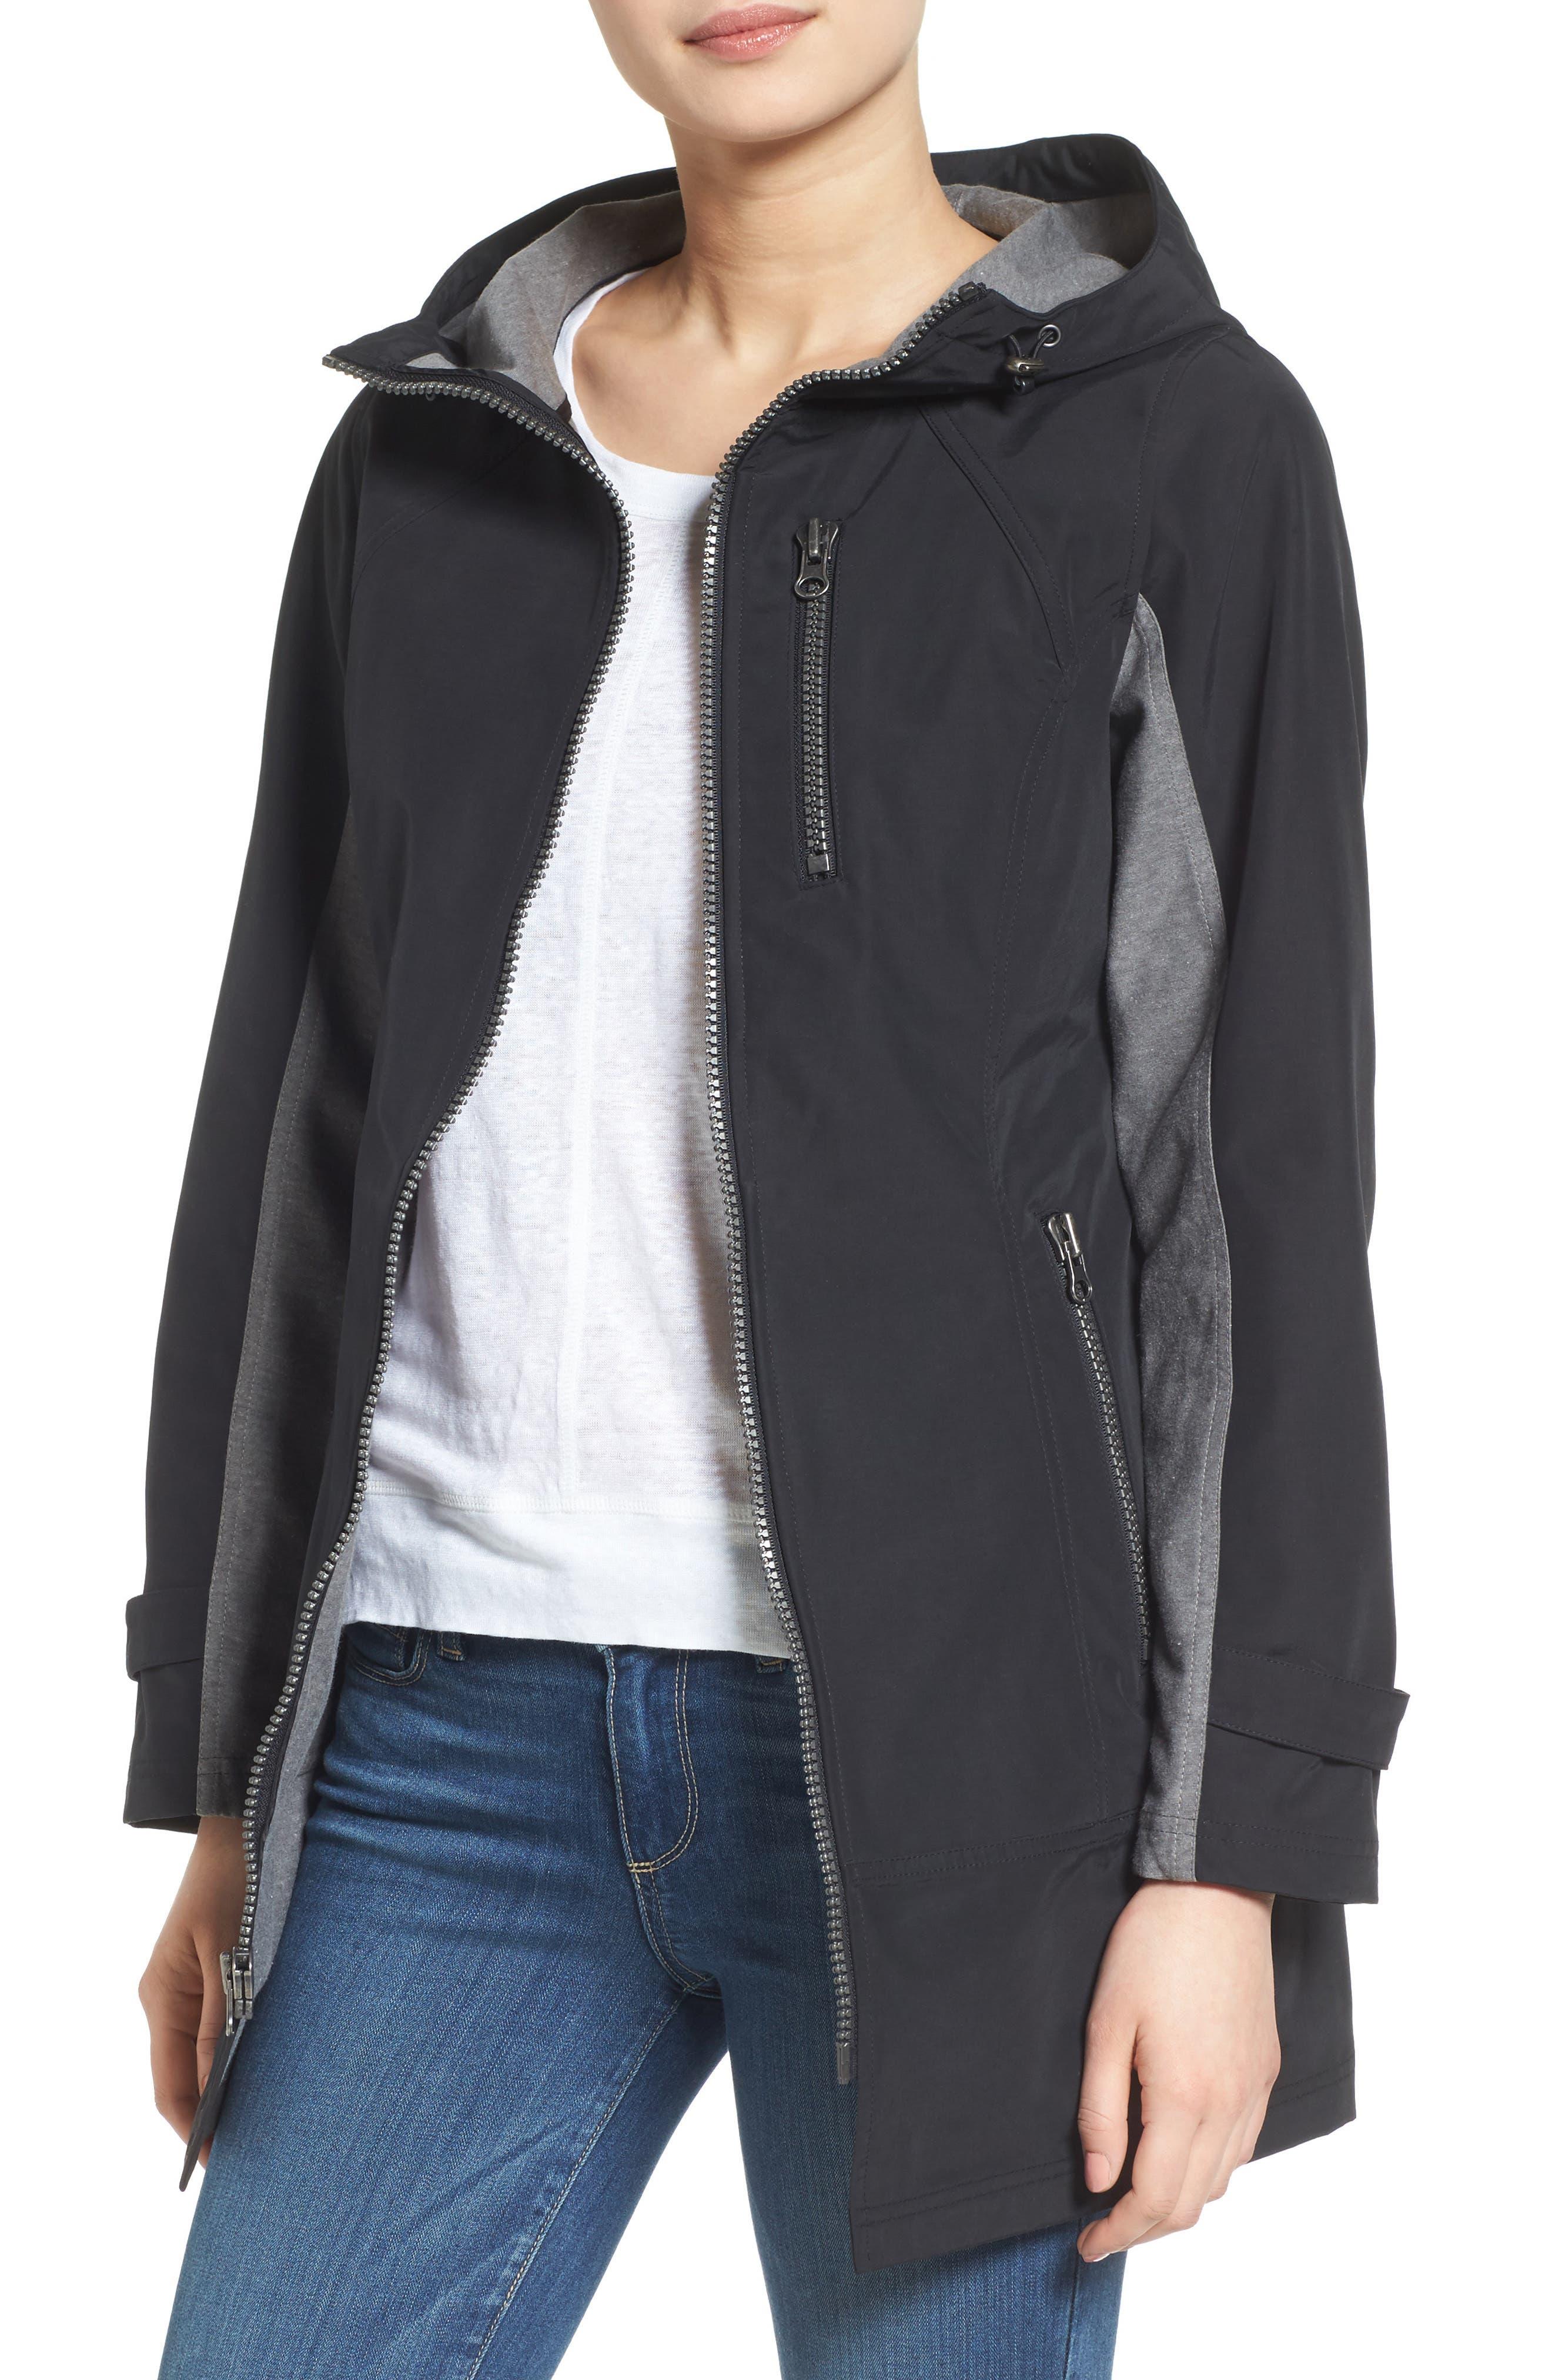 Kristen Blake Hooded Two-Tone Zip Front Jacket